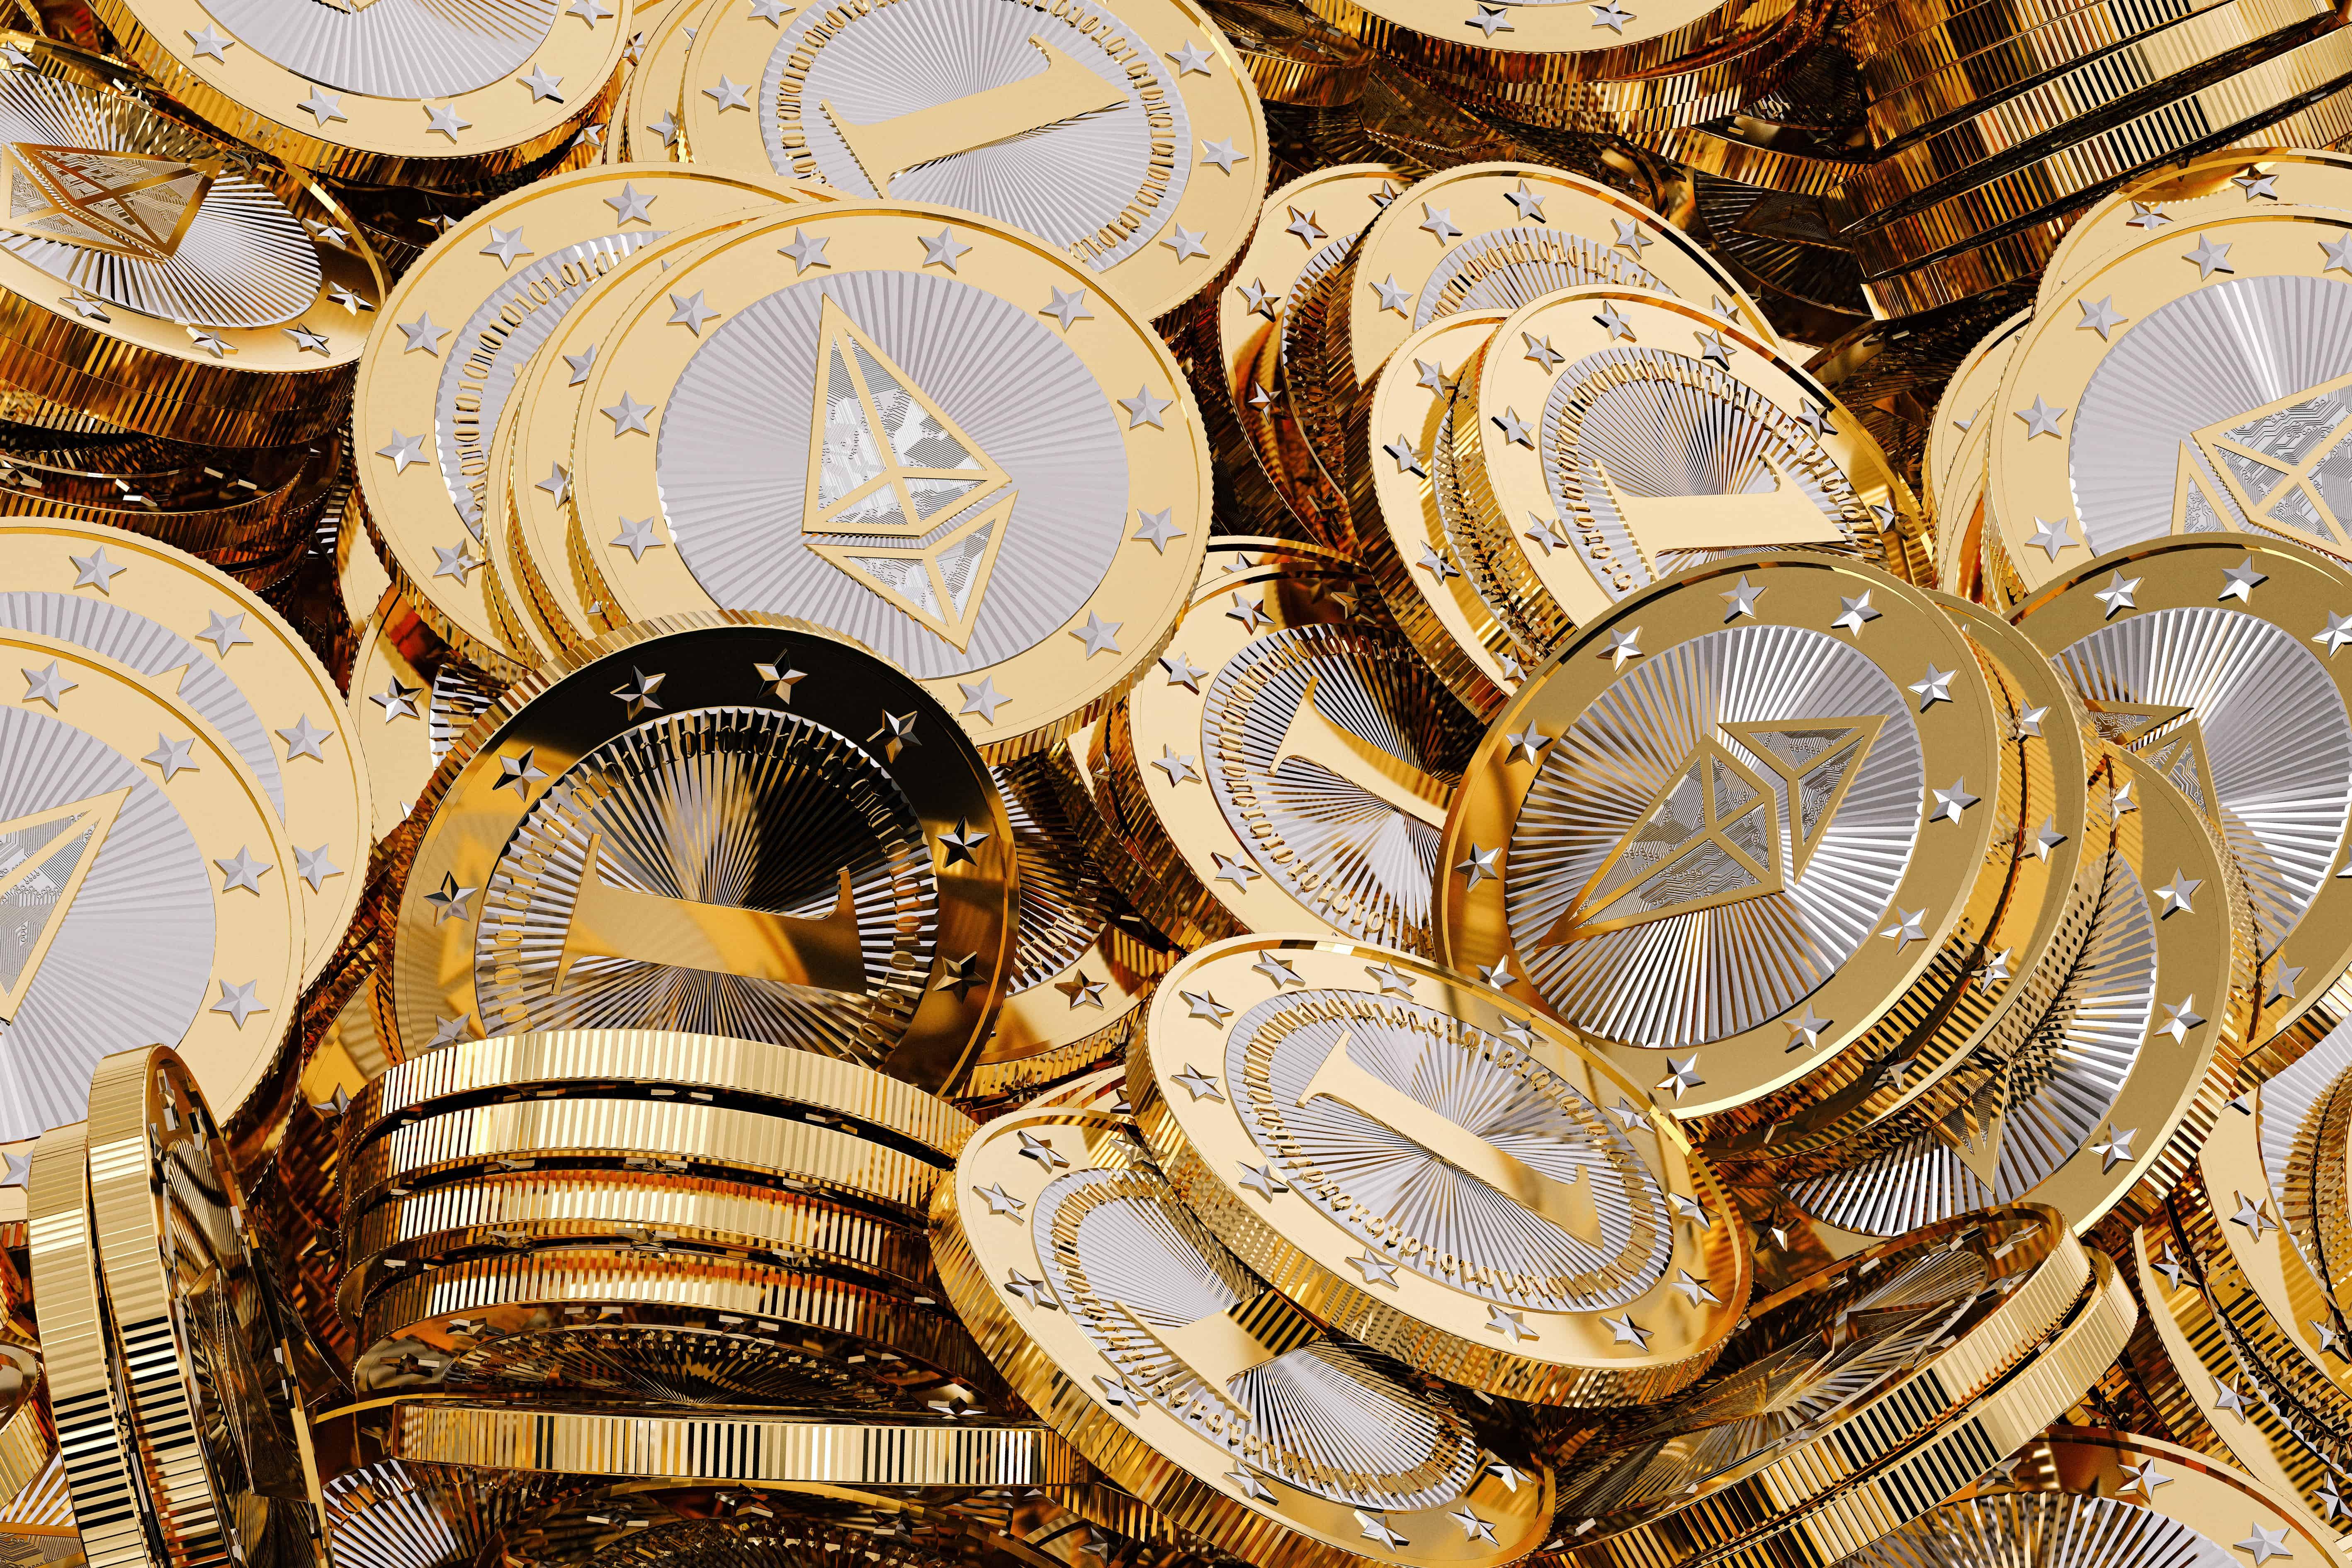 Ethereum ICO Hacks Rattle Investors